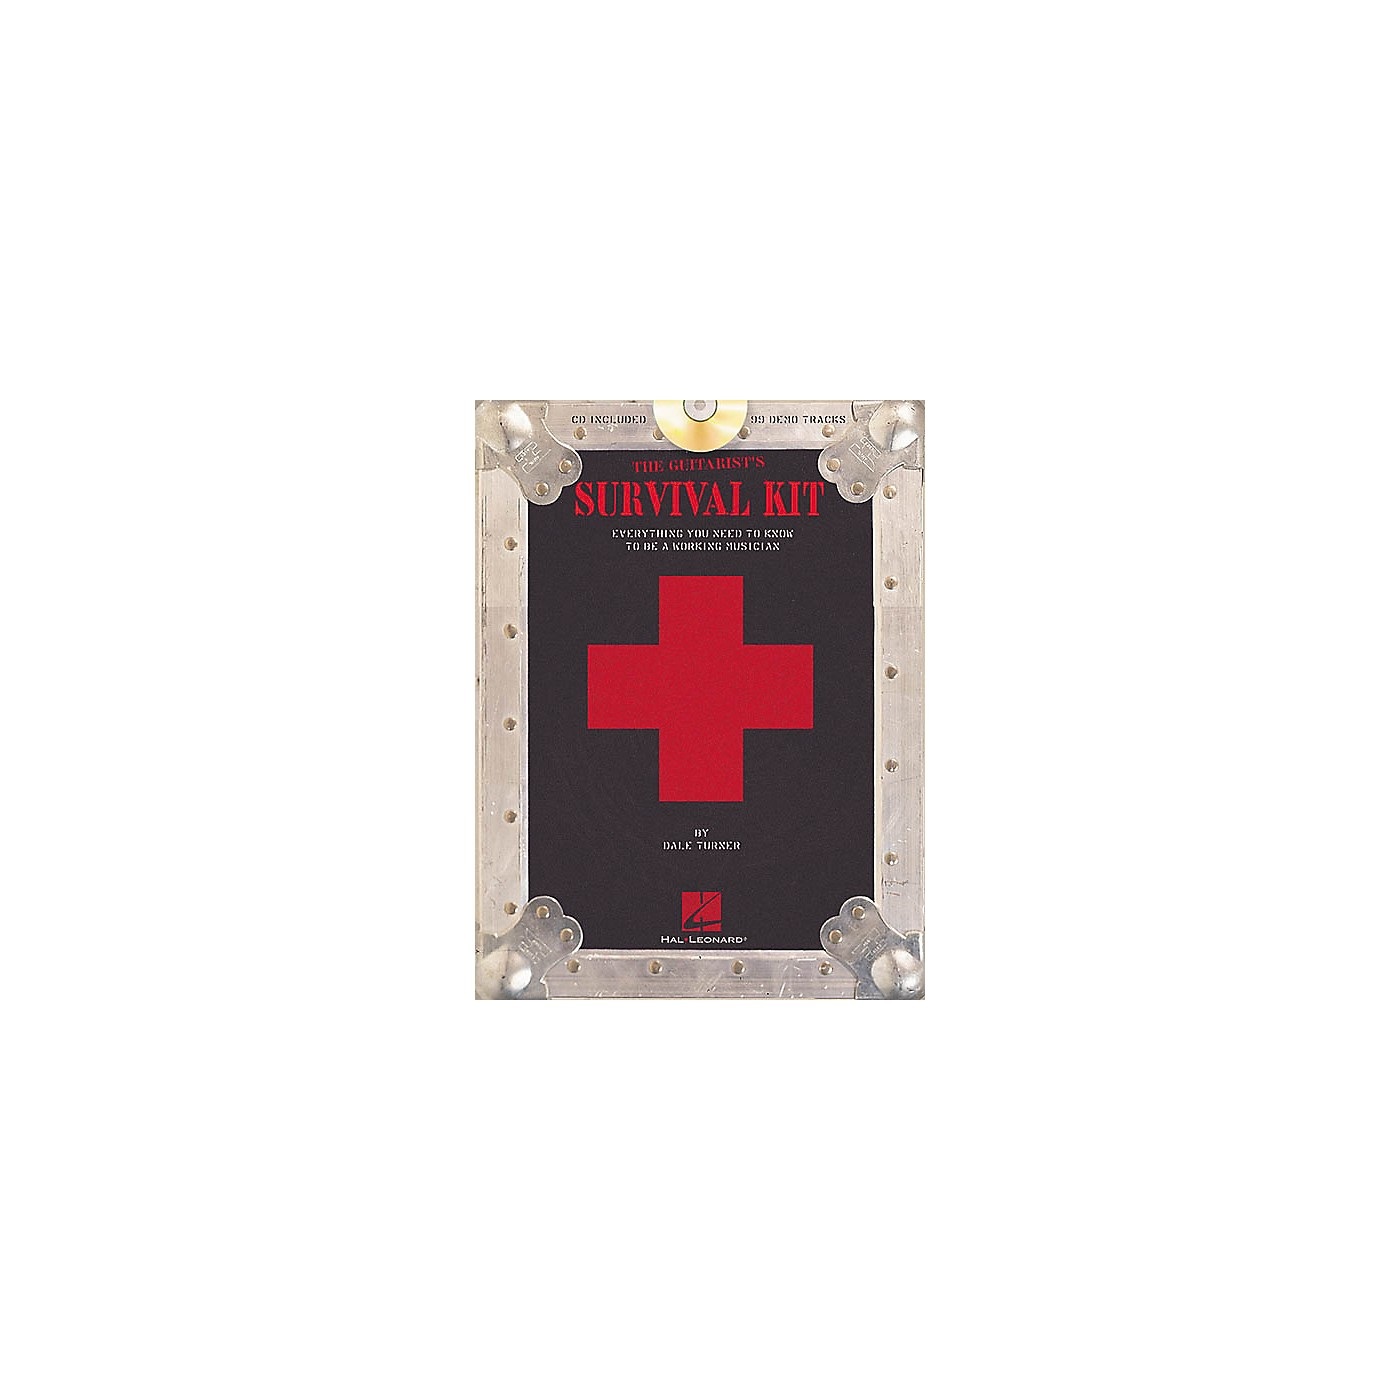 Hal Leonard The Guitarist's Survival Kit (Book/CD) thumbnail